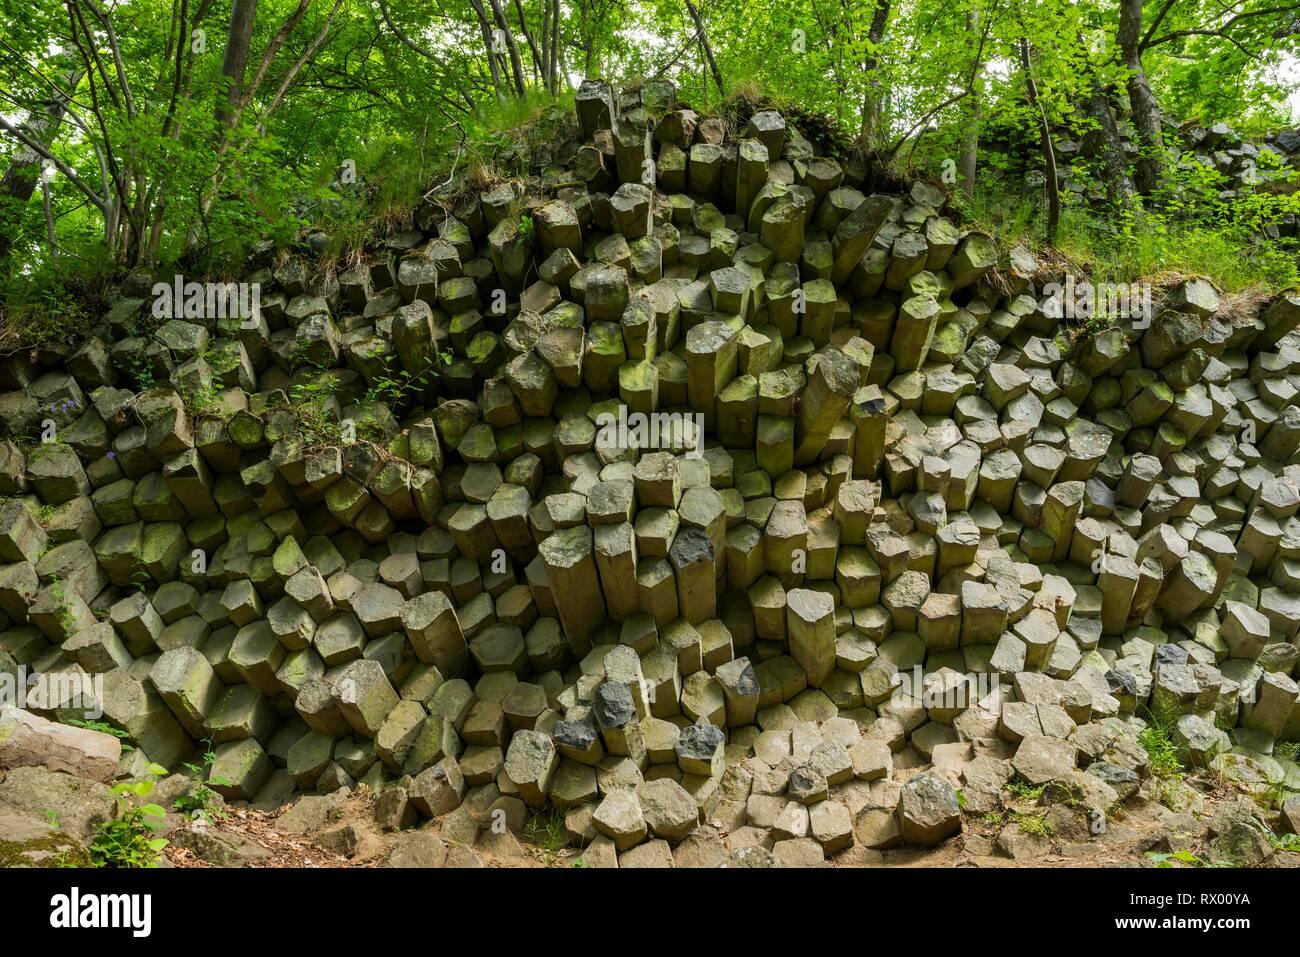 Basalt prisms, Gangolfsberg, Rhön Biosphere Reserve, Bavaria, Germany - Stock Image